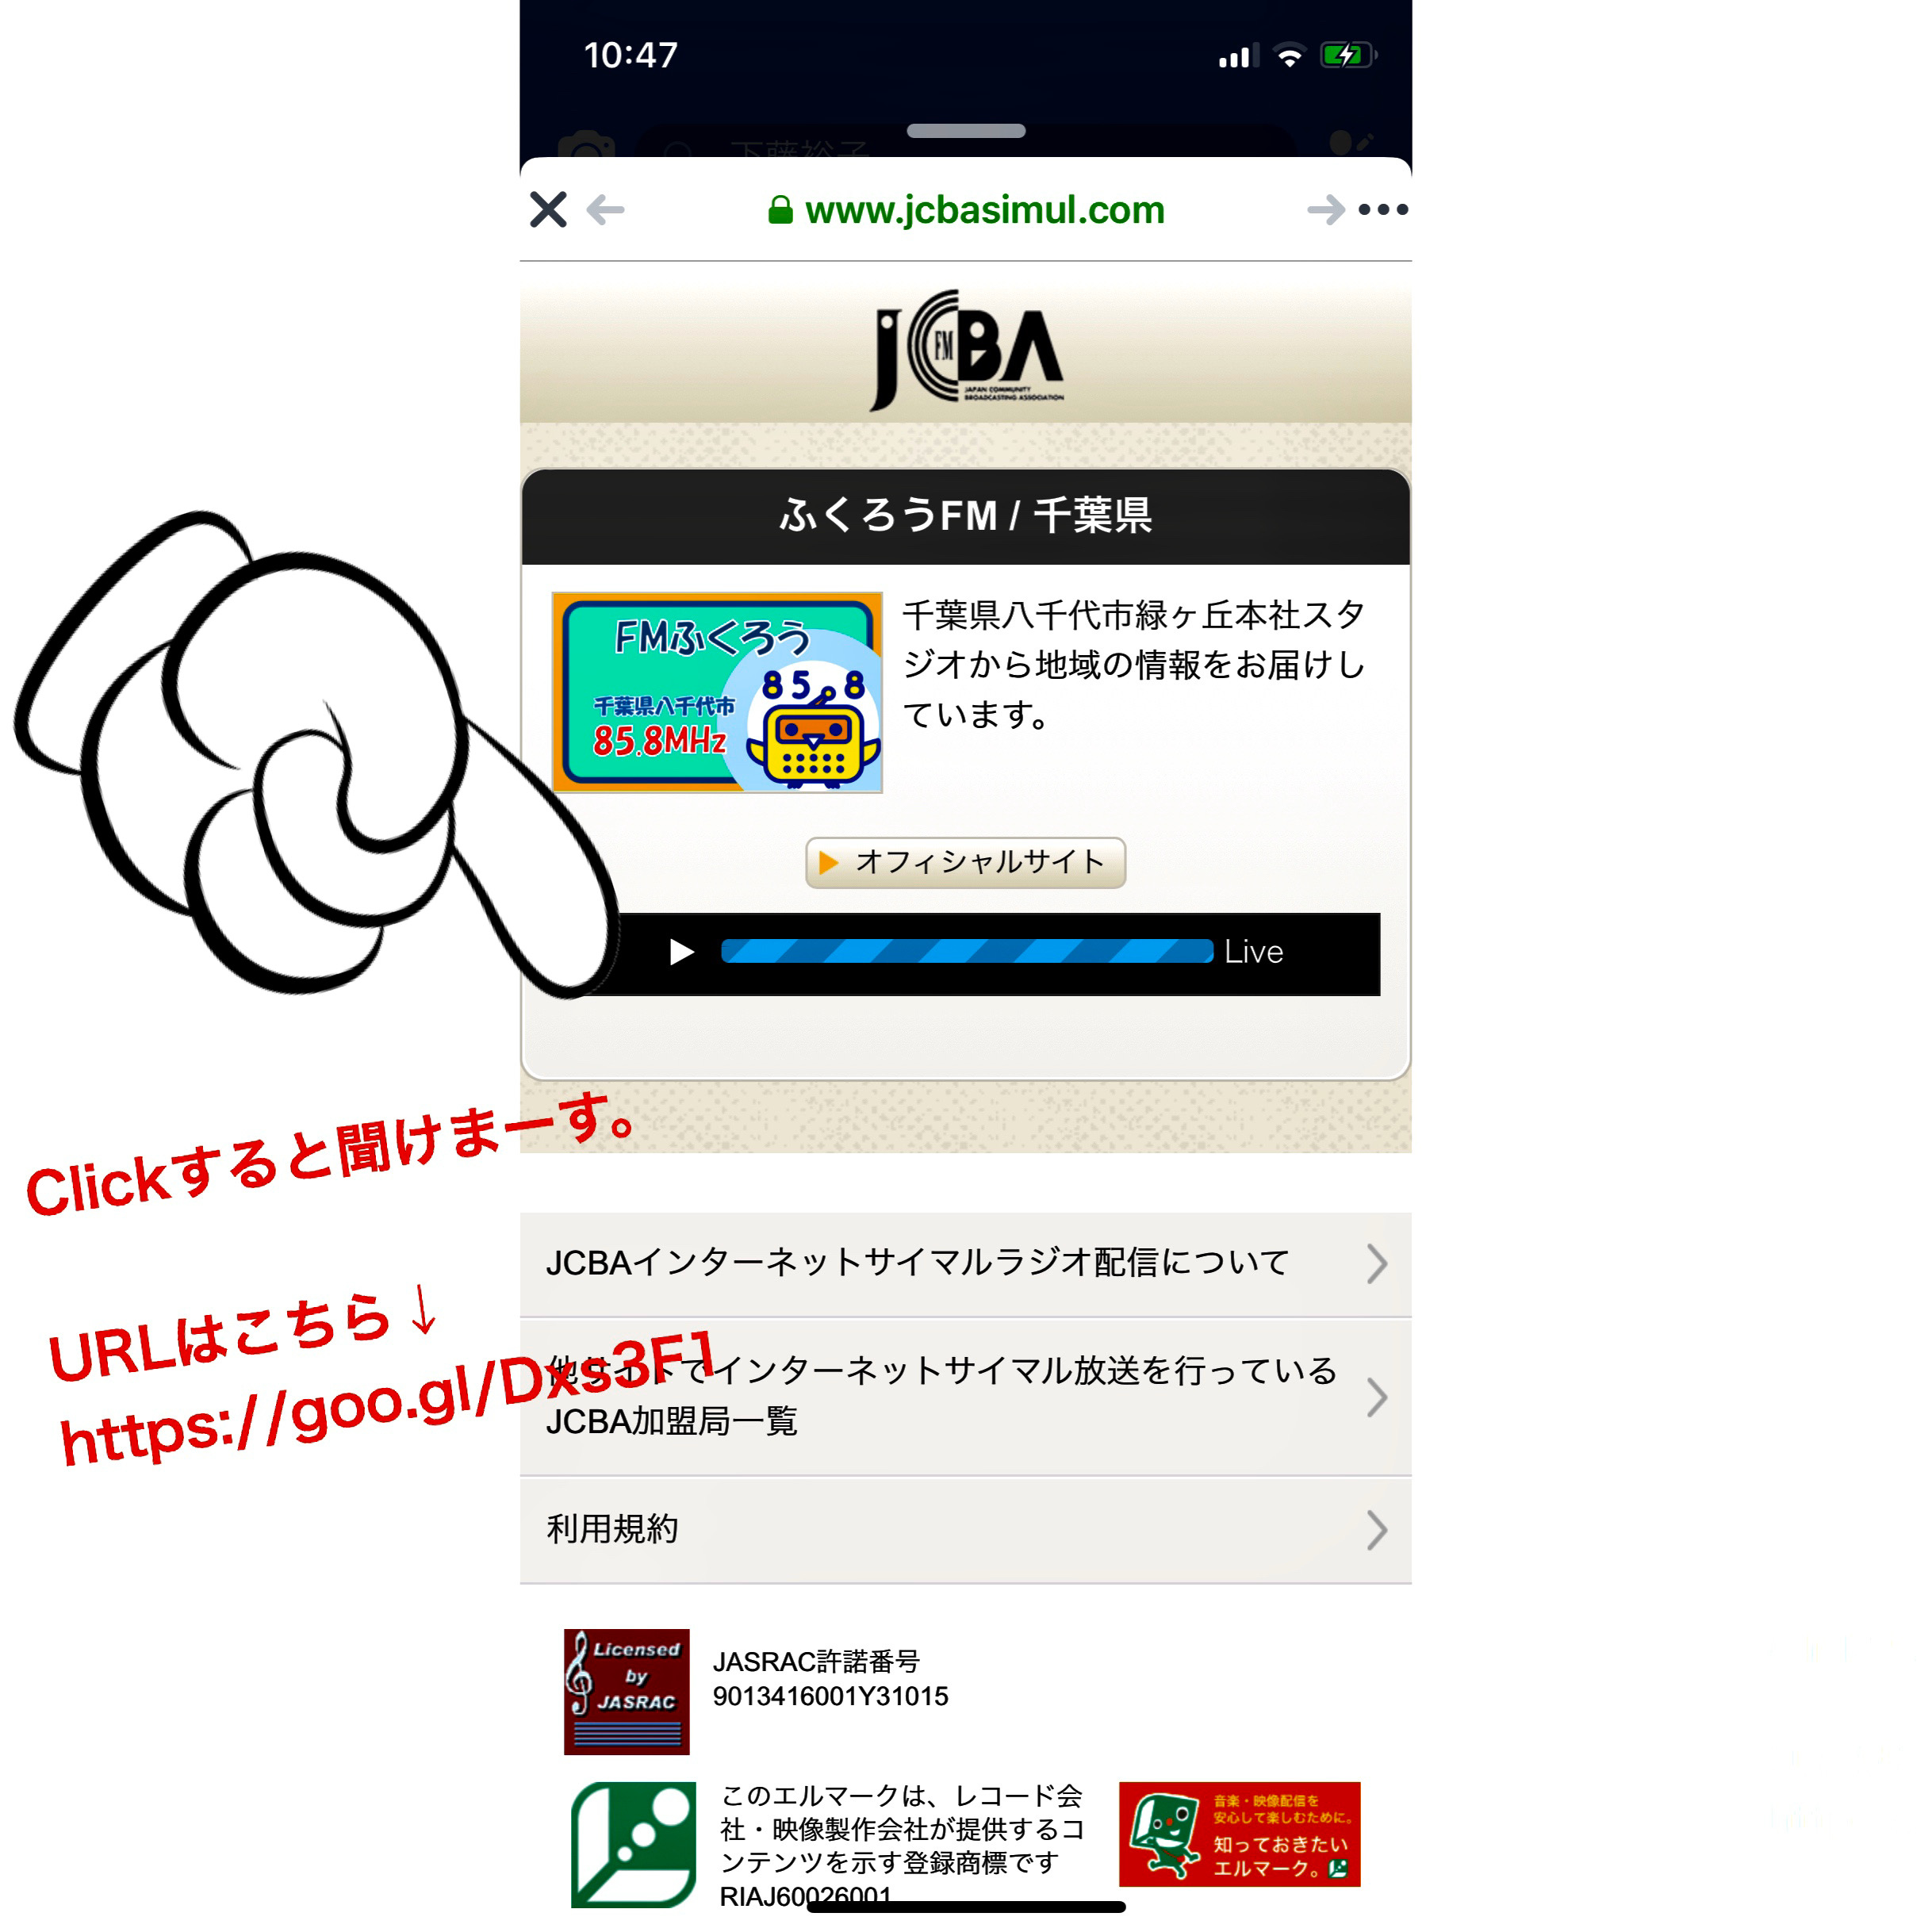 jcba インターネット サイマル ラジオ